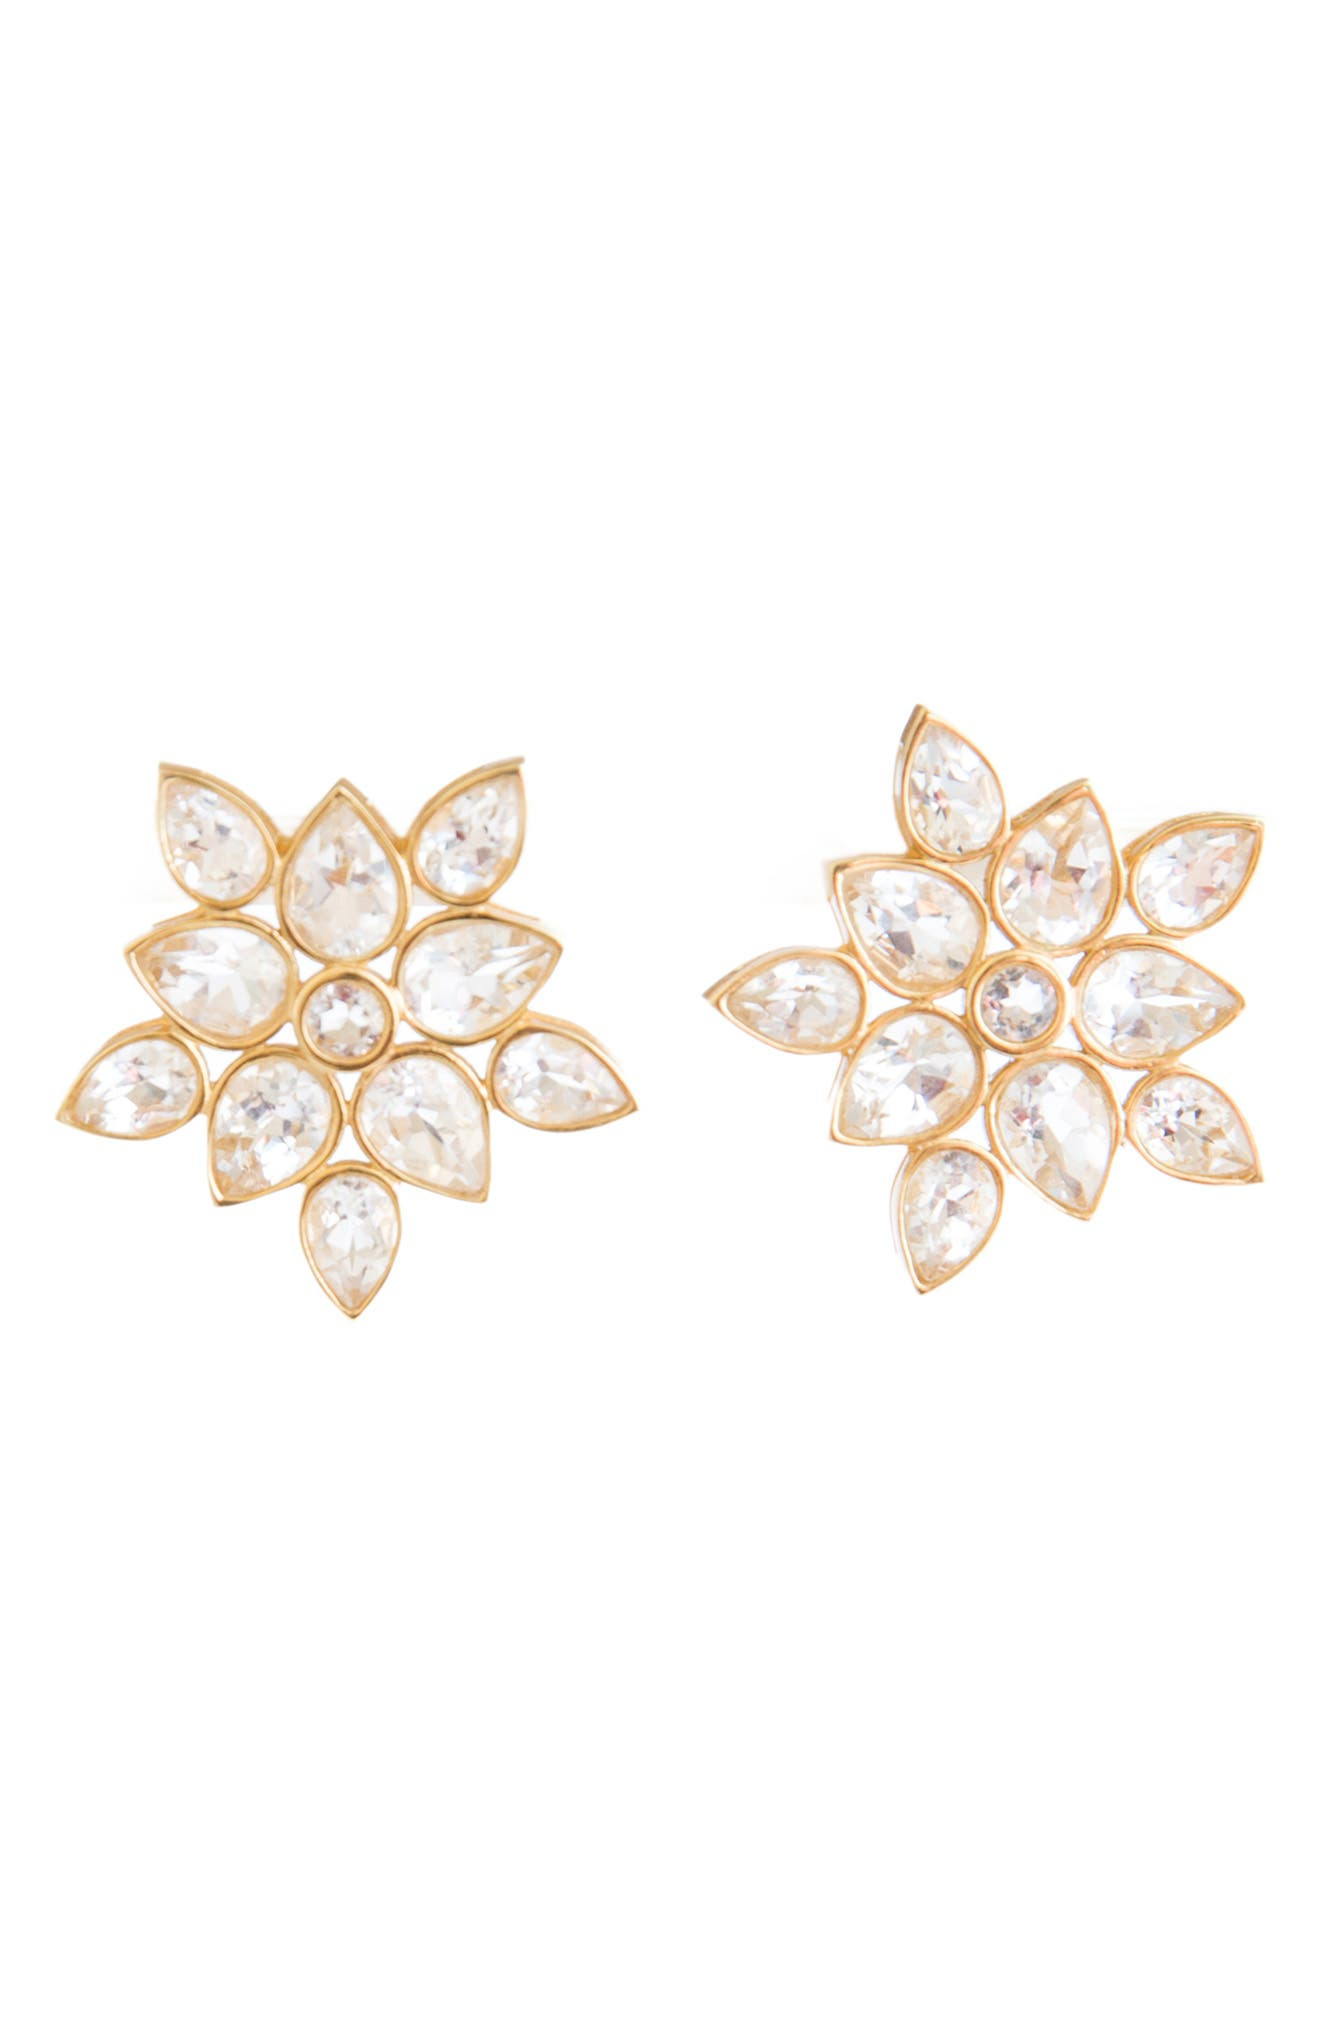 Heather Crystal Stud Earrings